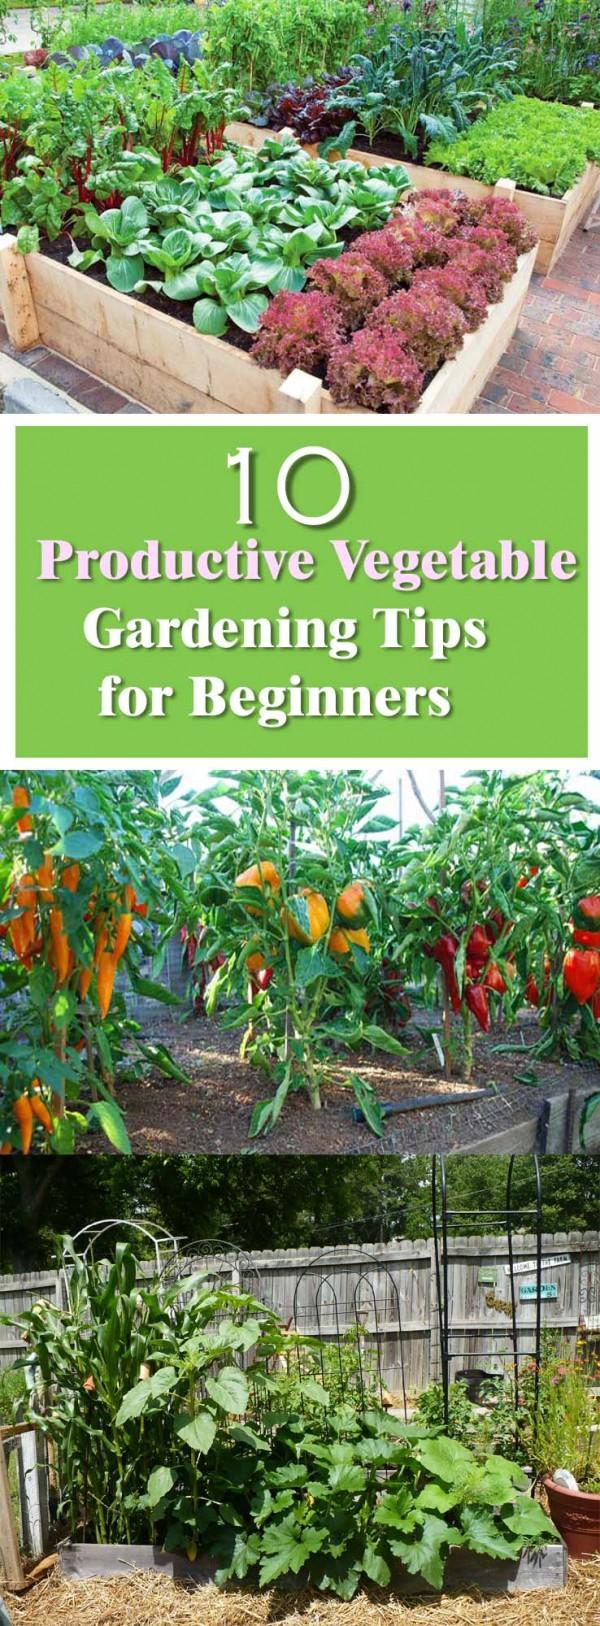 10 Productive Vegetable Gardening Tips for Beginners Dan330